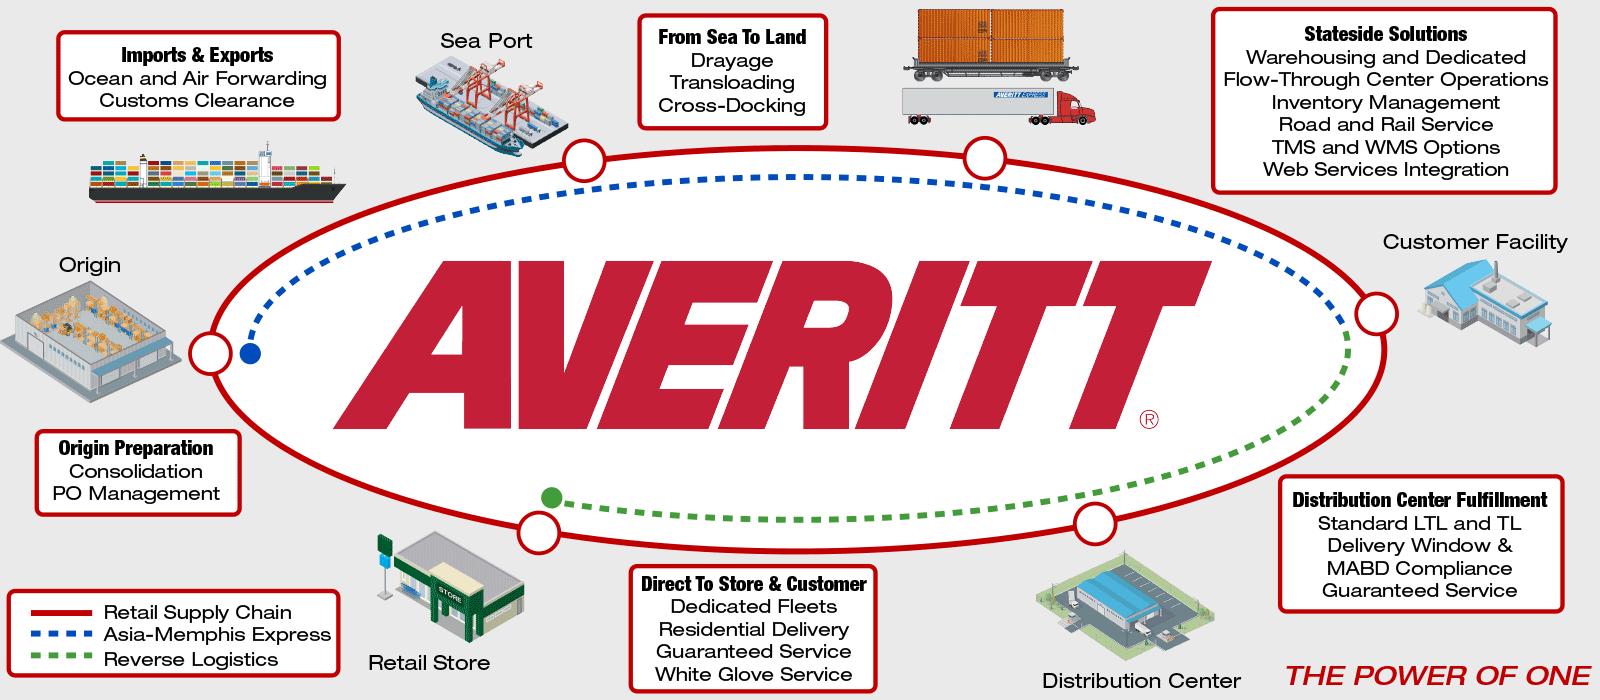 retail-supply-chain-slider.png